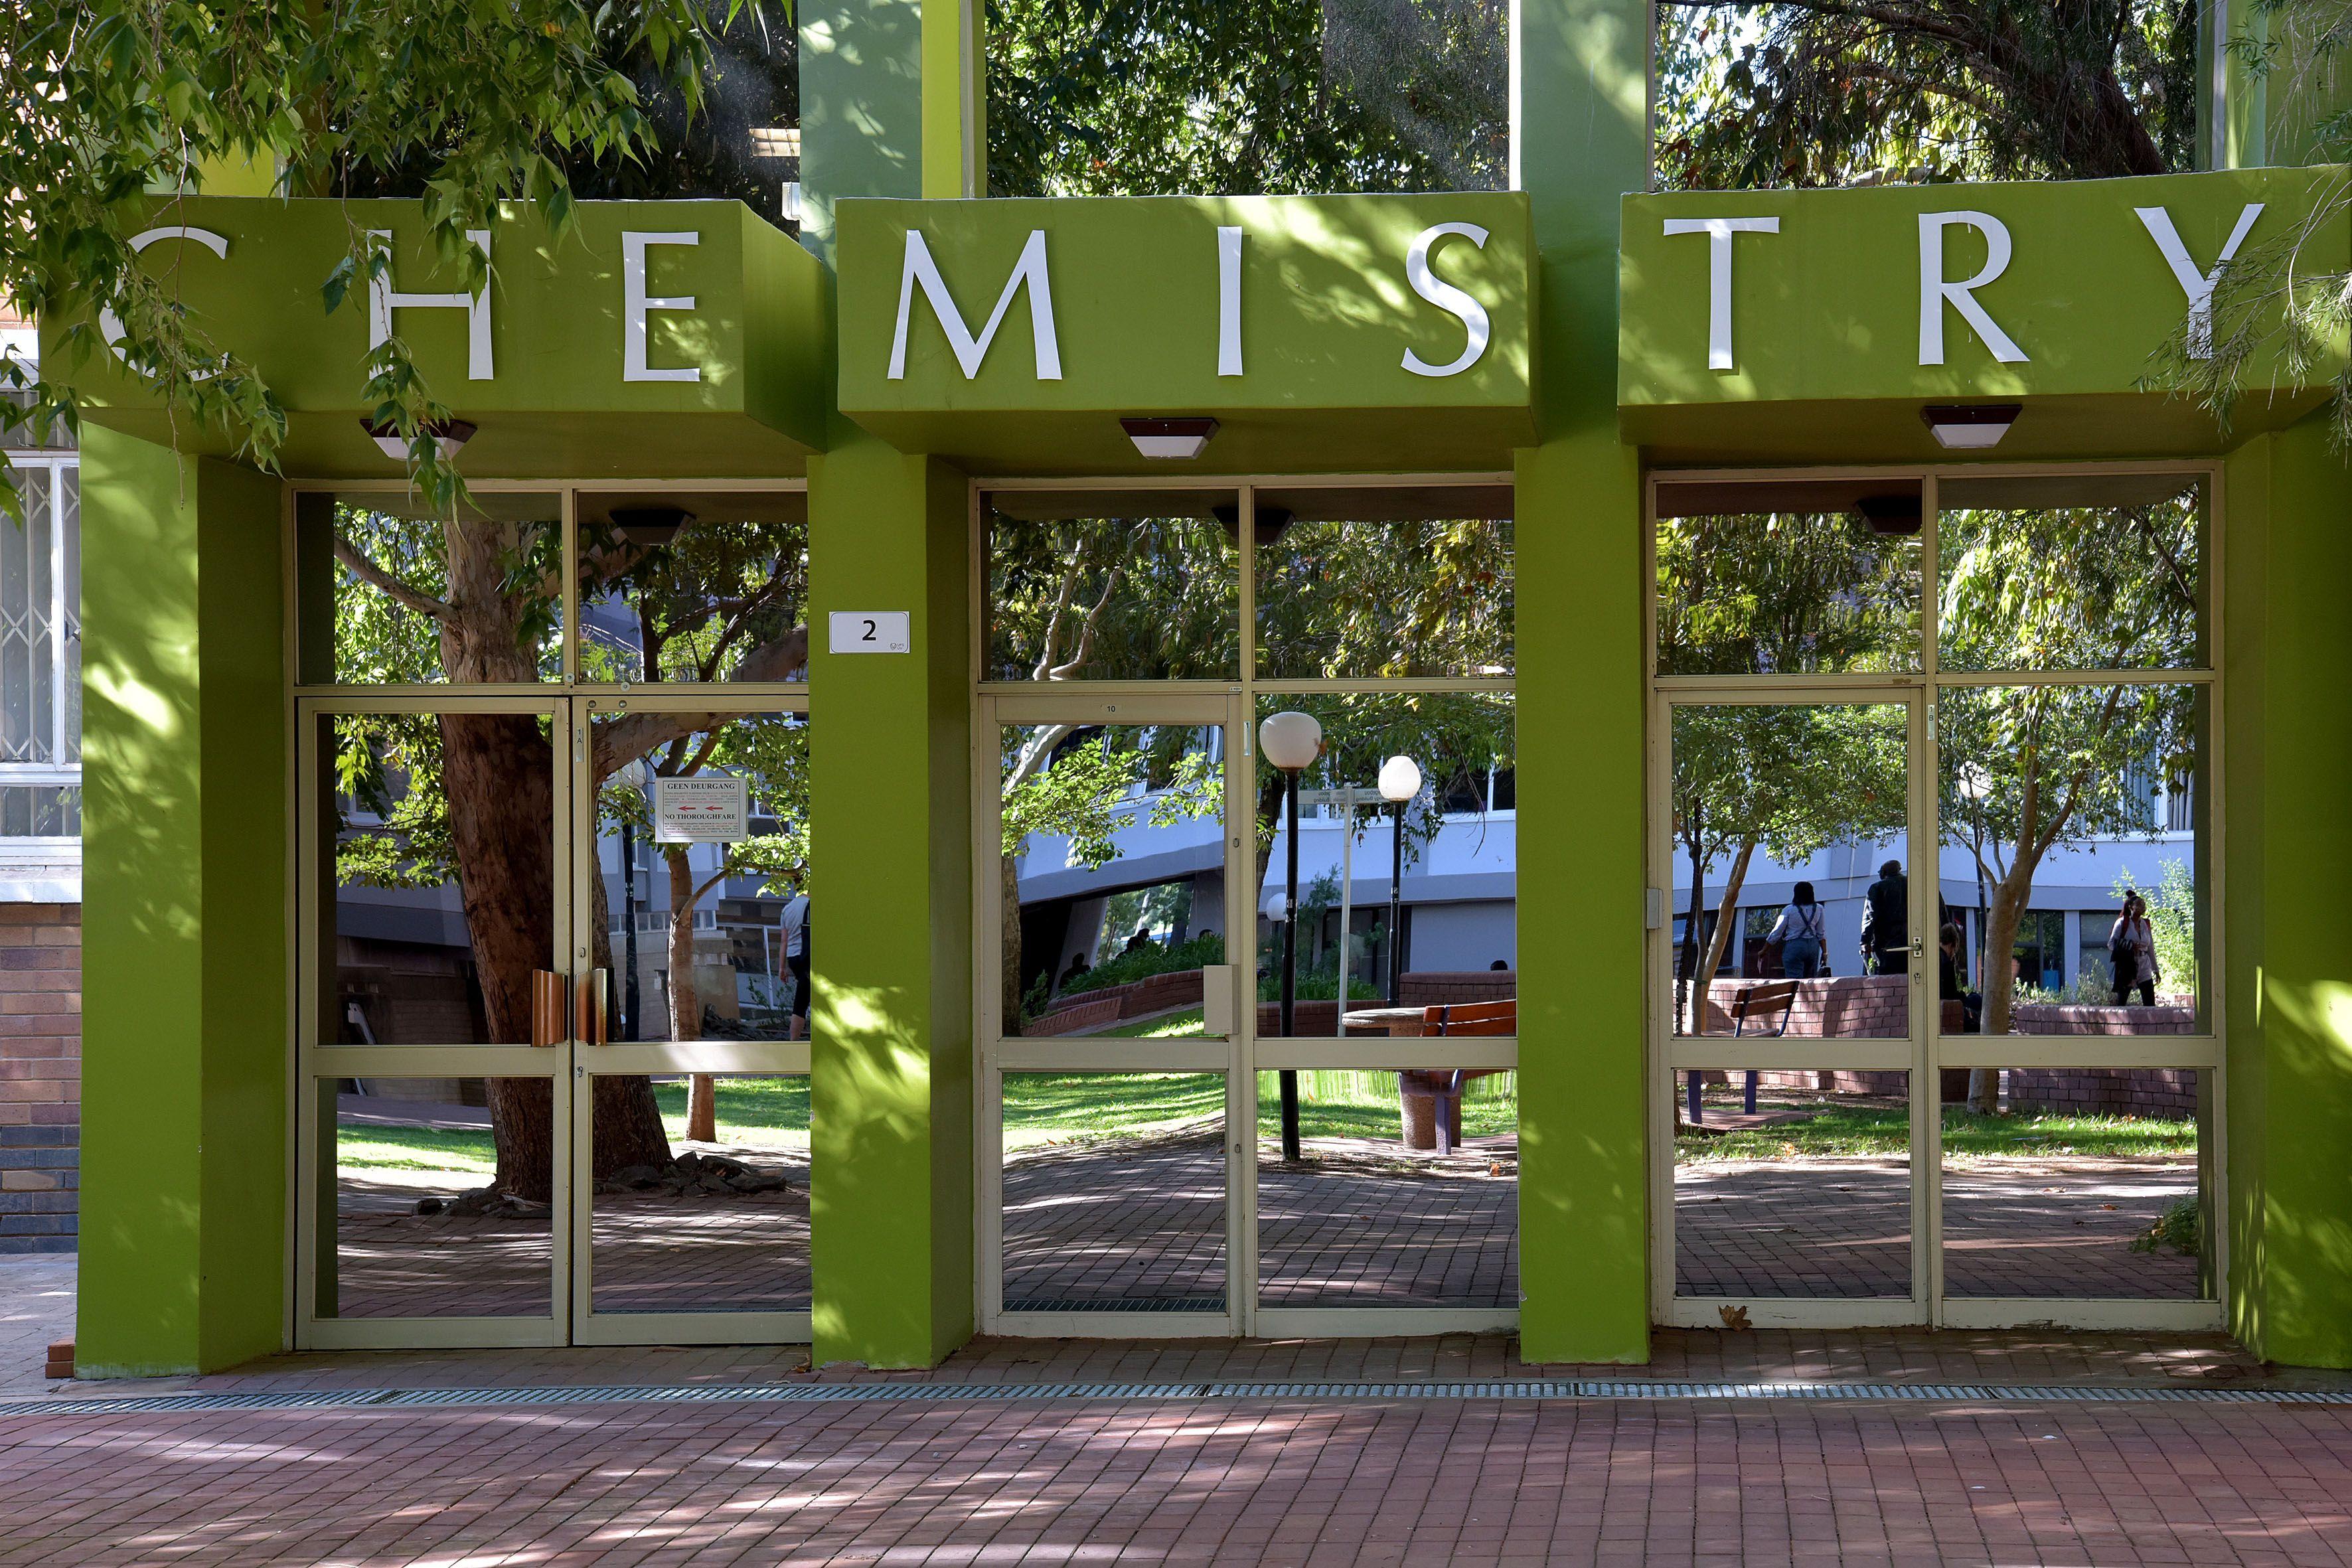 University of the Free State, Bloemfontein Campus, Chemistry building (Photo: Charl Devenish)